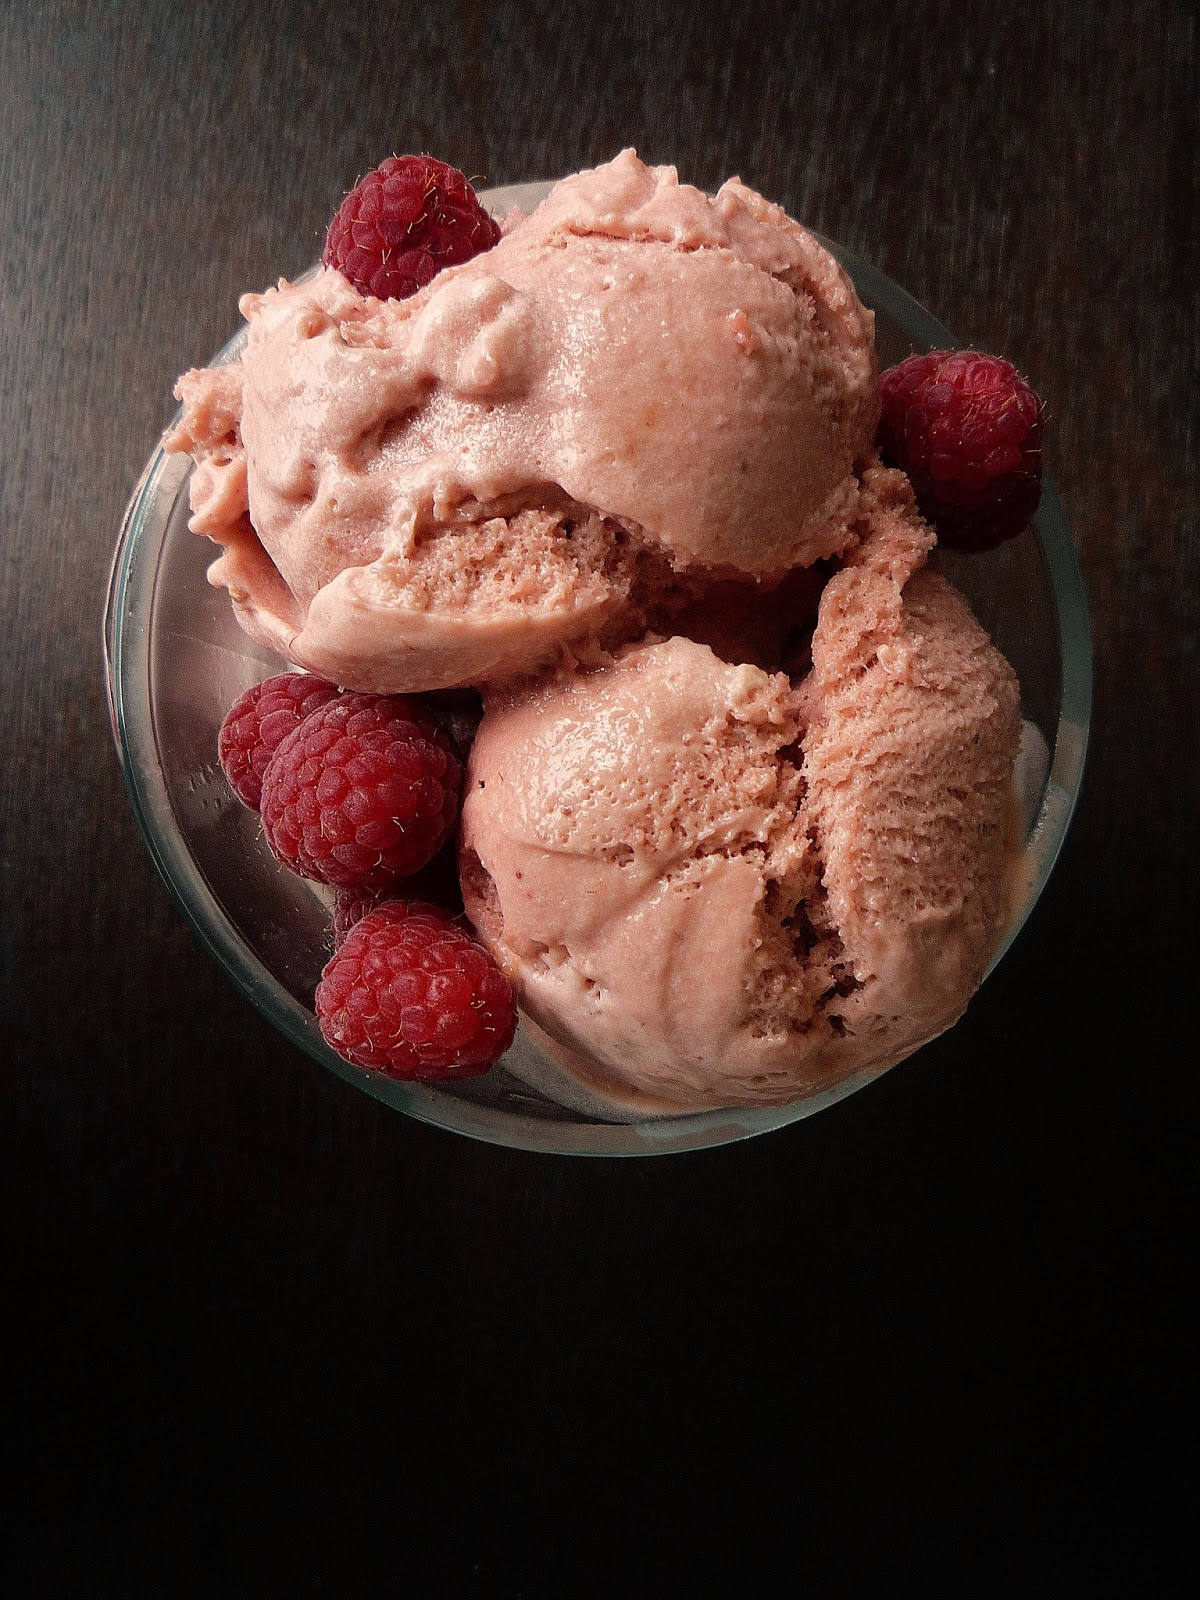 Raspberry Gelato 5 - beingabear.com